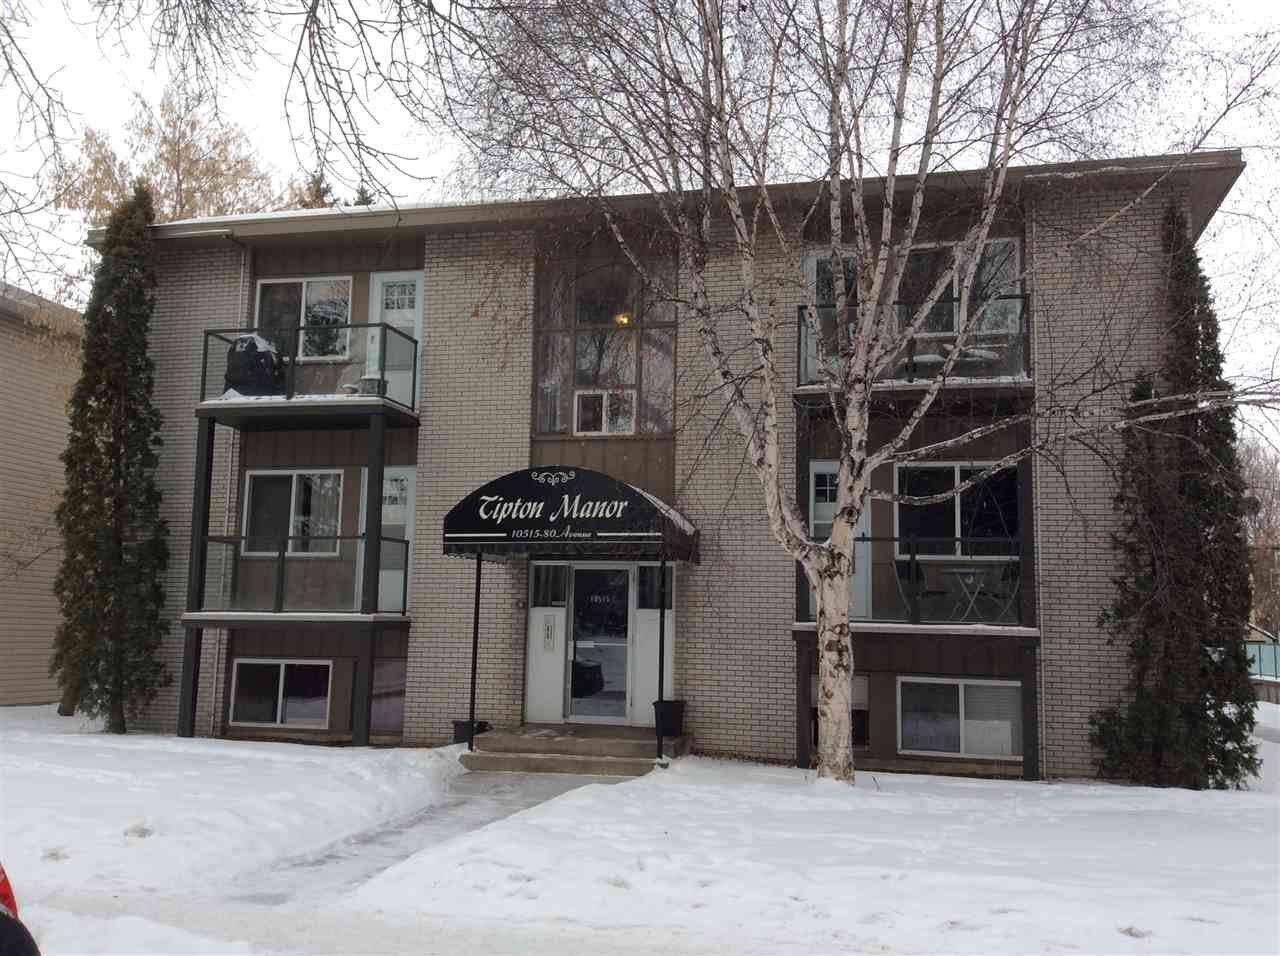 Main Photo: 1 10515 80 Street NW in Edmonton: Zone 15 Condo for sale : MLS®# E4190434